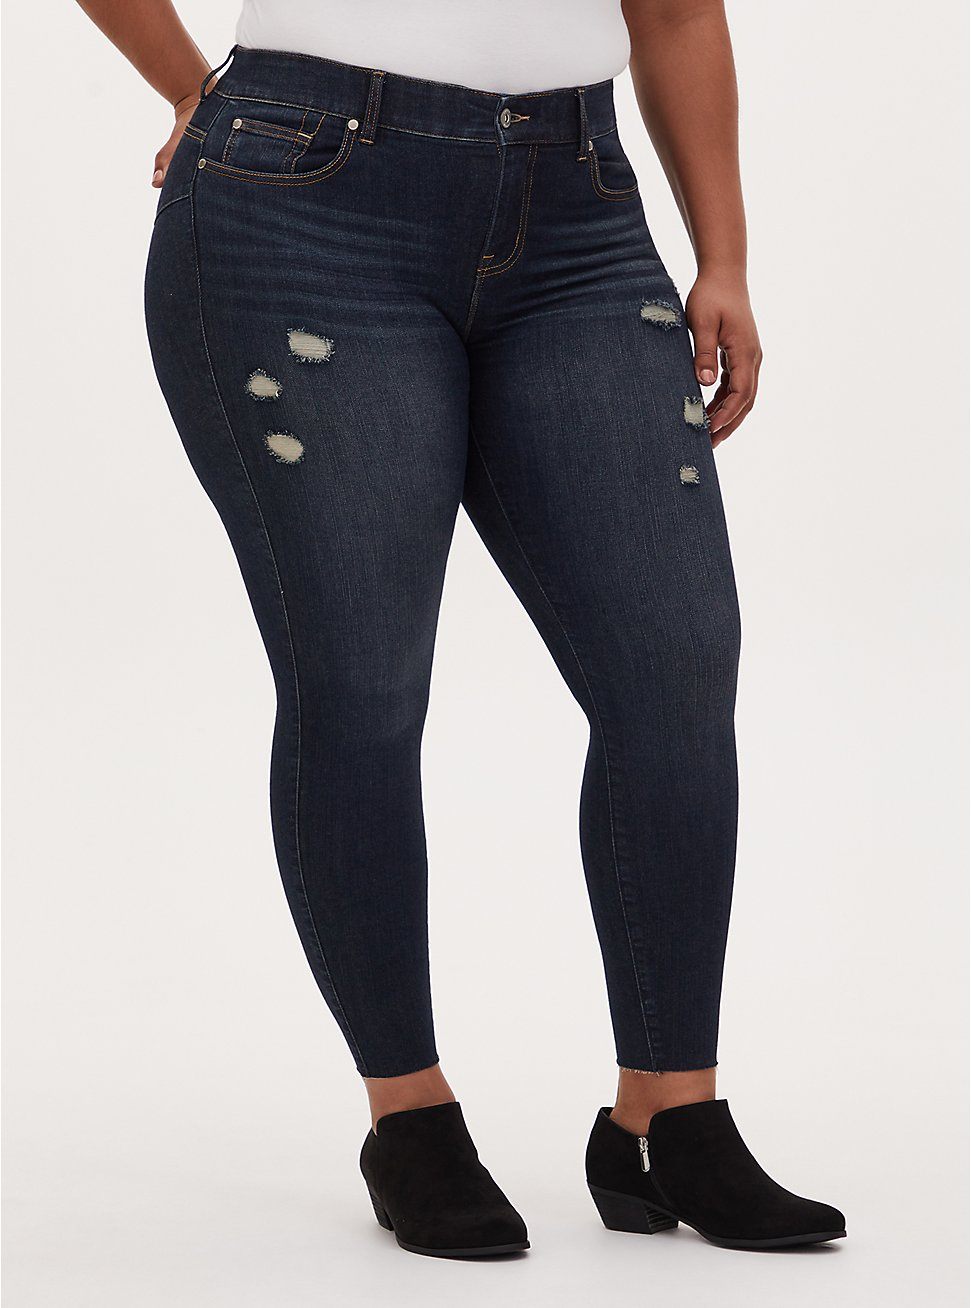 Bombshell Skinny Jean - Premium Stretch Dark Wash with Raw Hem, NEWCASTLE, hi-res